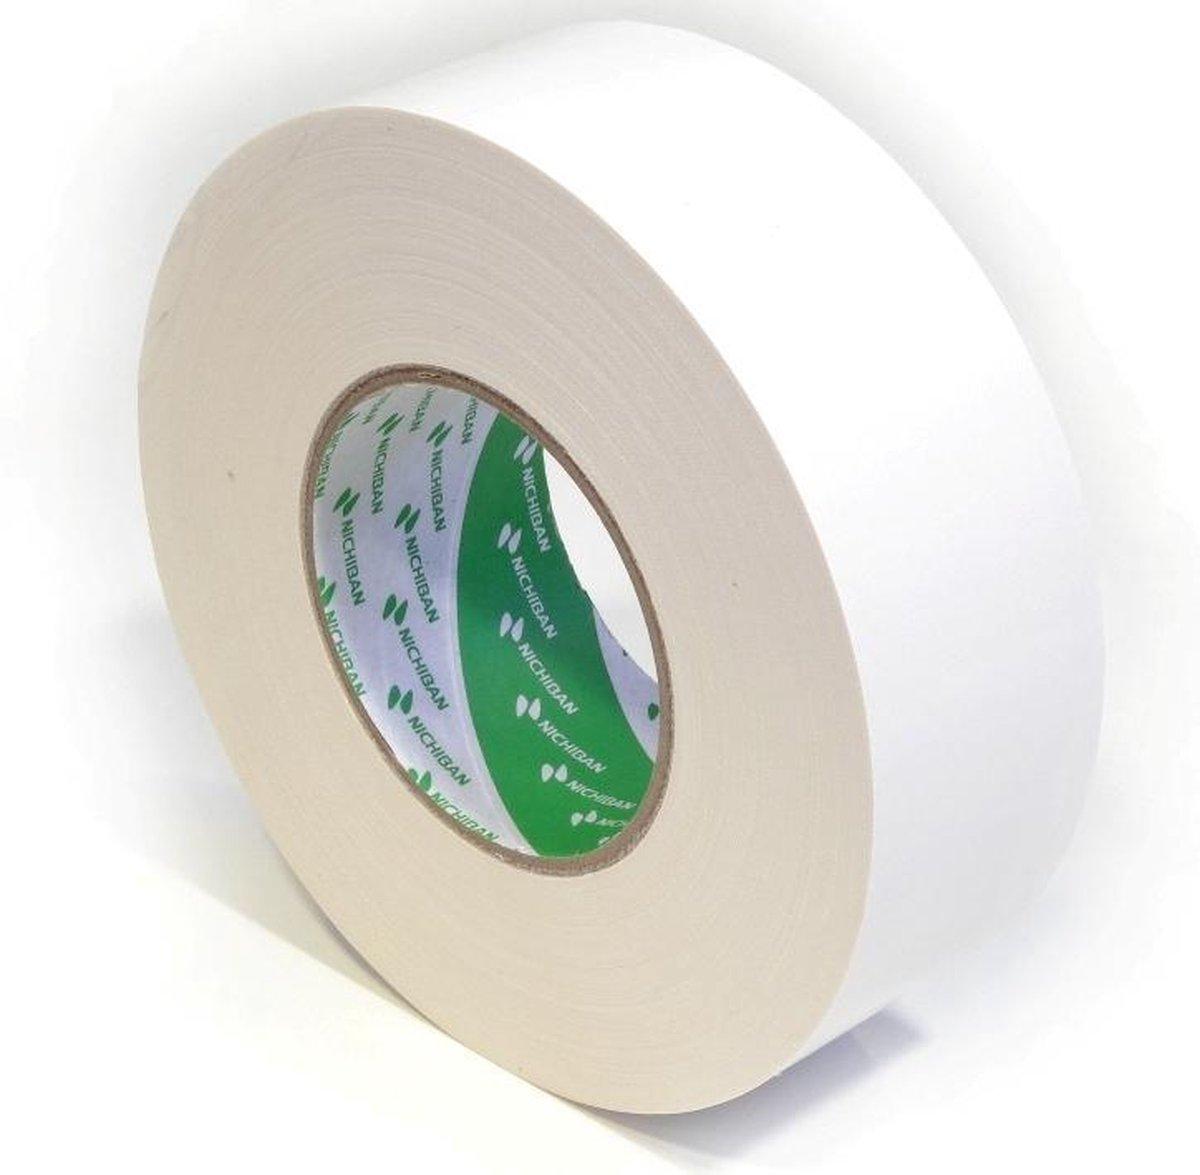 Nichiban   -  duct tape    -  50 mm x 50 m   - - Nichiban